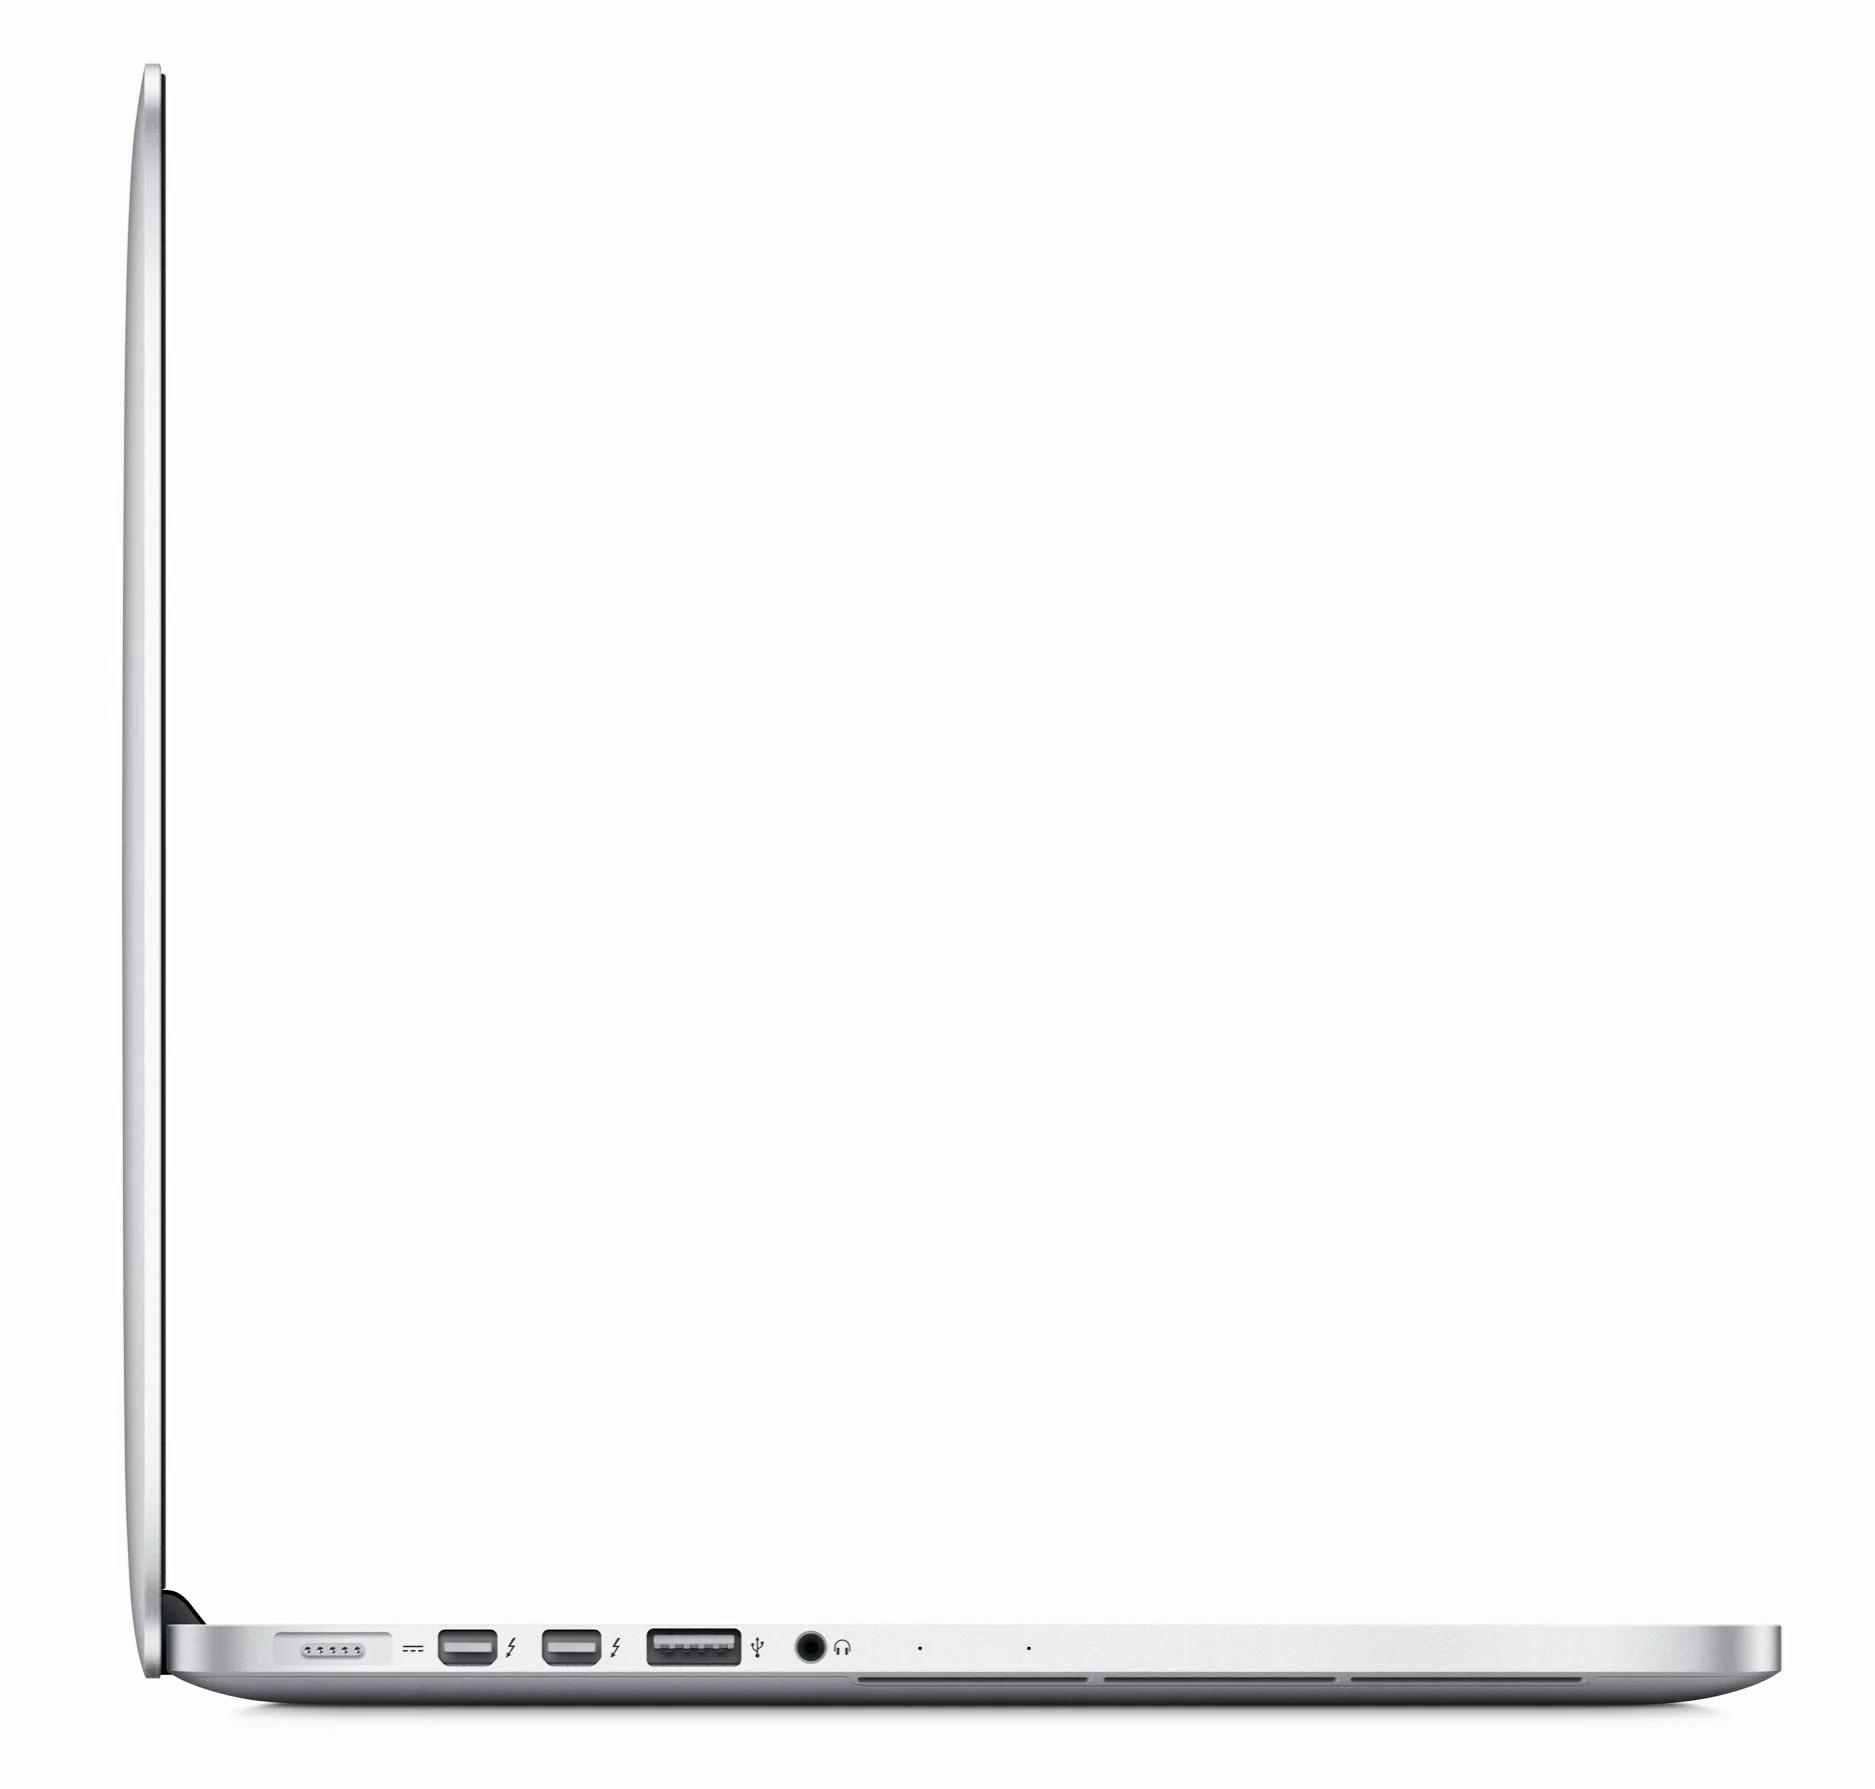 GainSaver: Refurbished Apple A Grade Macbook Pro 13.3-inch